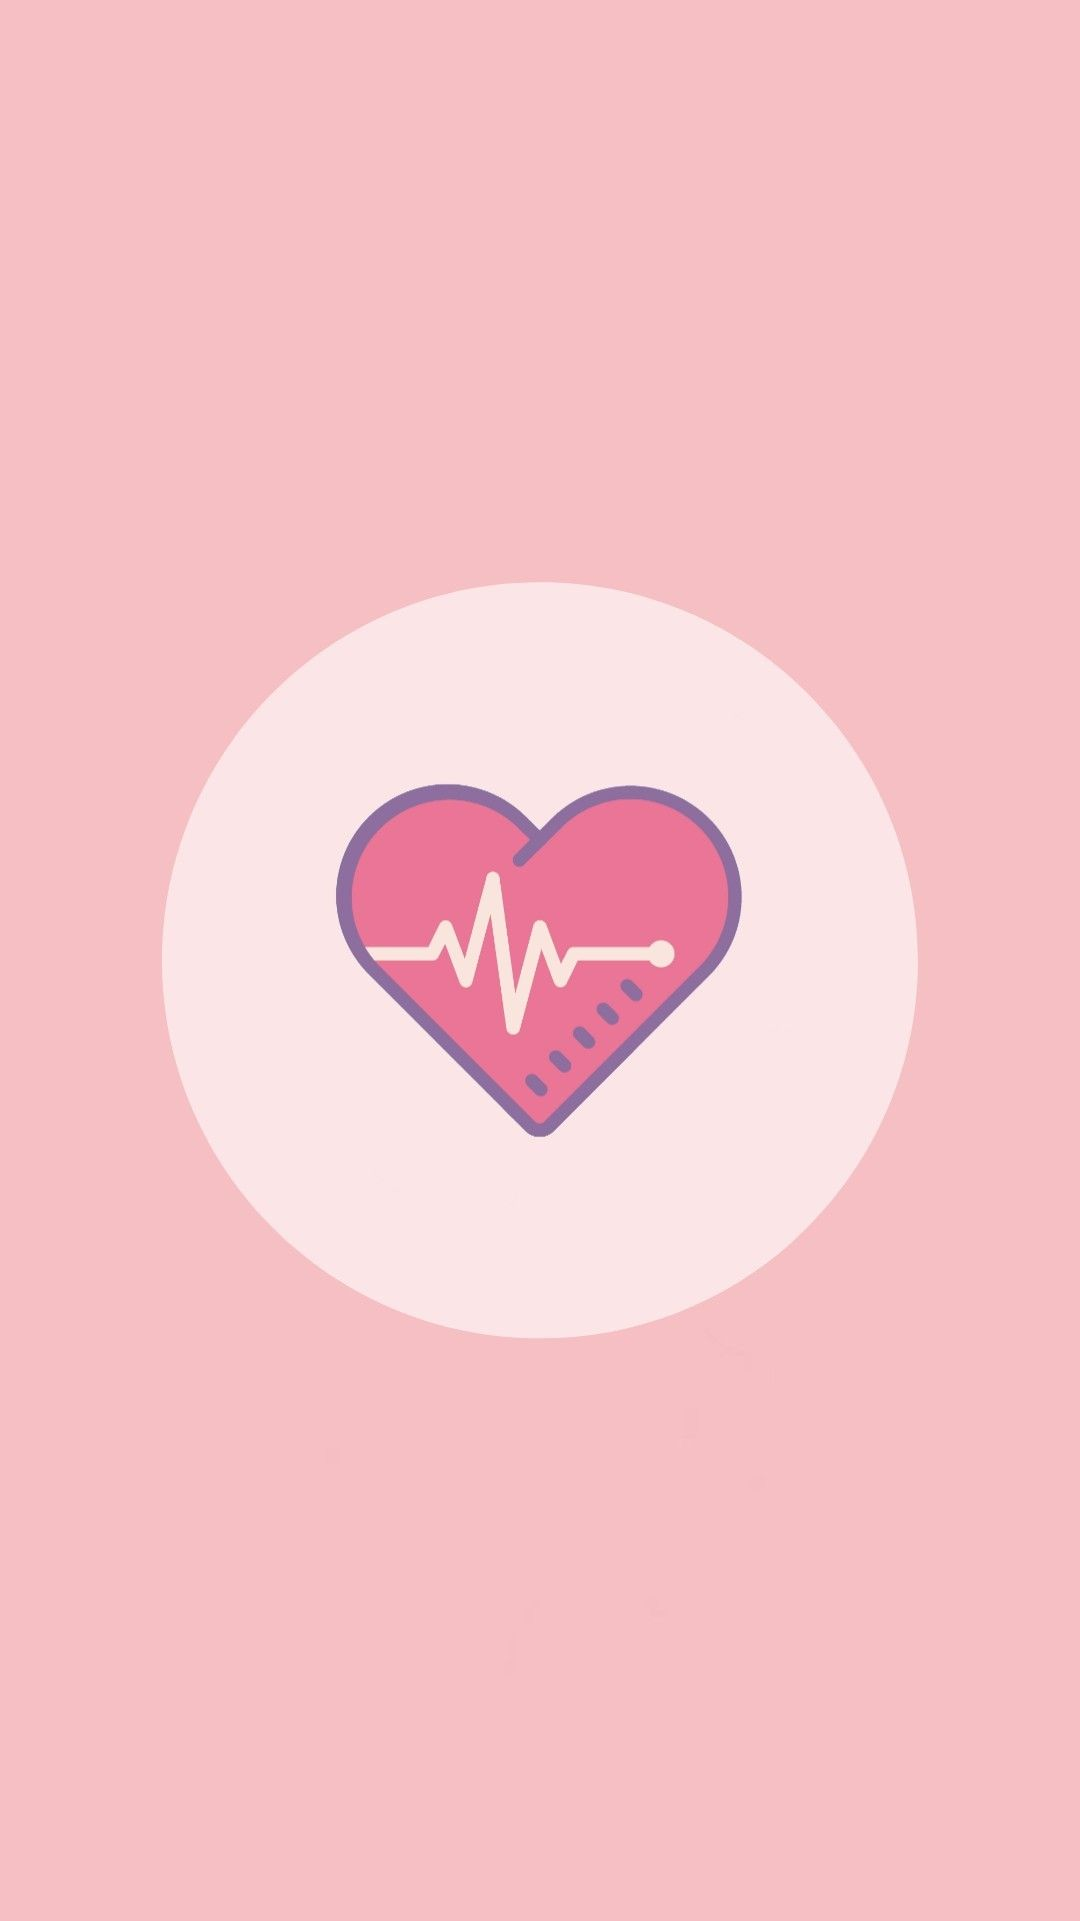 Health aesthetic icon logo